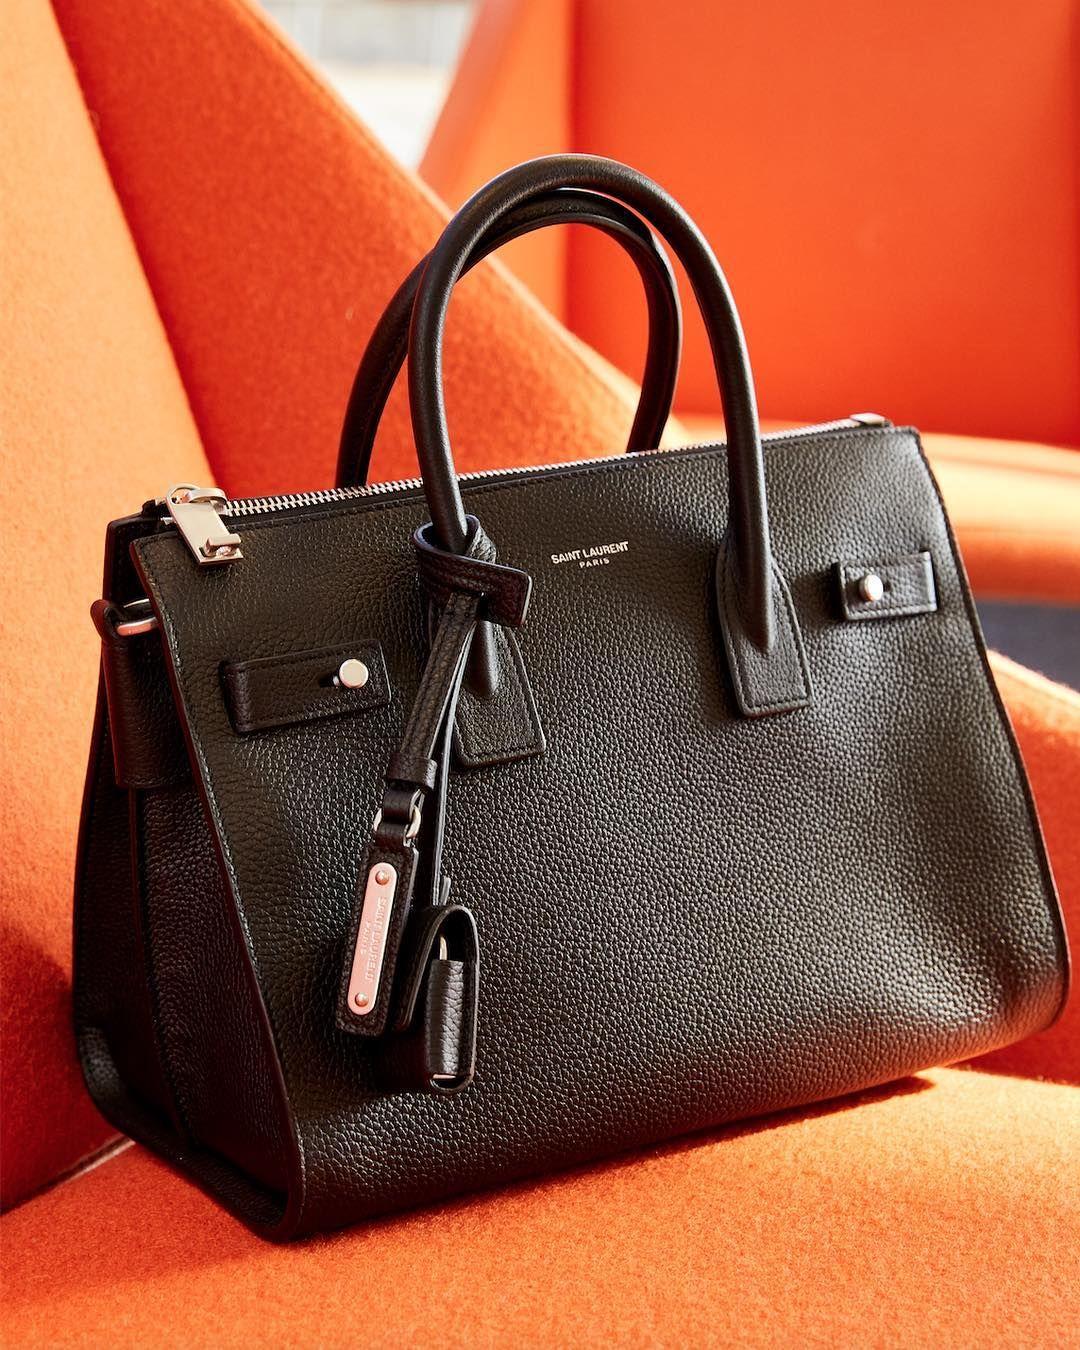 7486596f90 YSL Sac de Jour is a classic. | Purses in 2019 | Bags, Ysl handbags ...